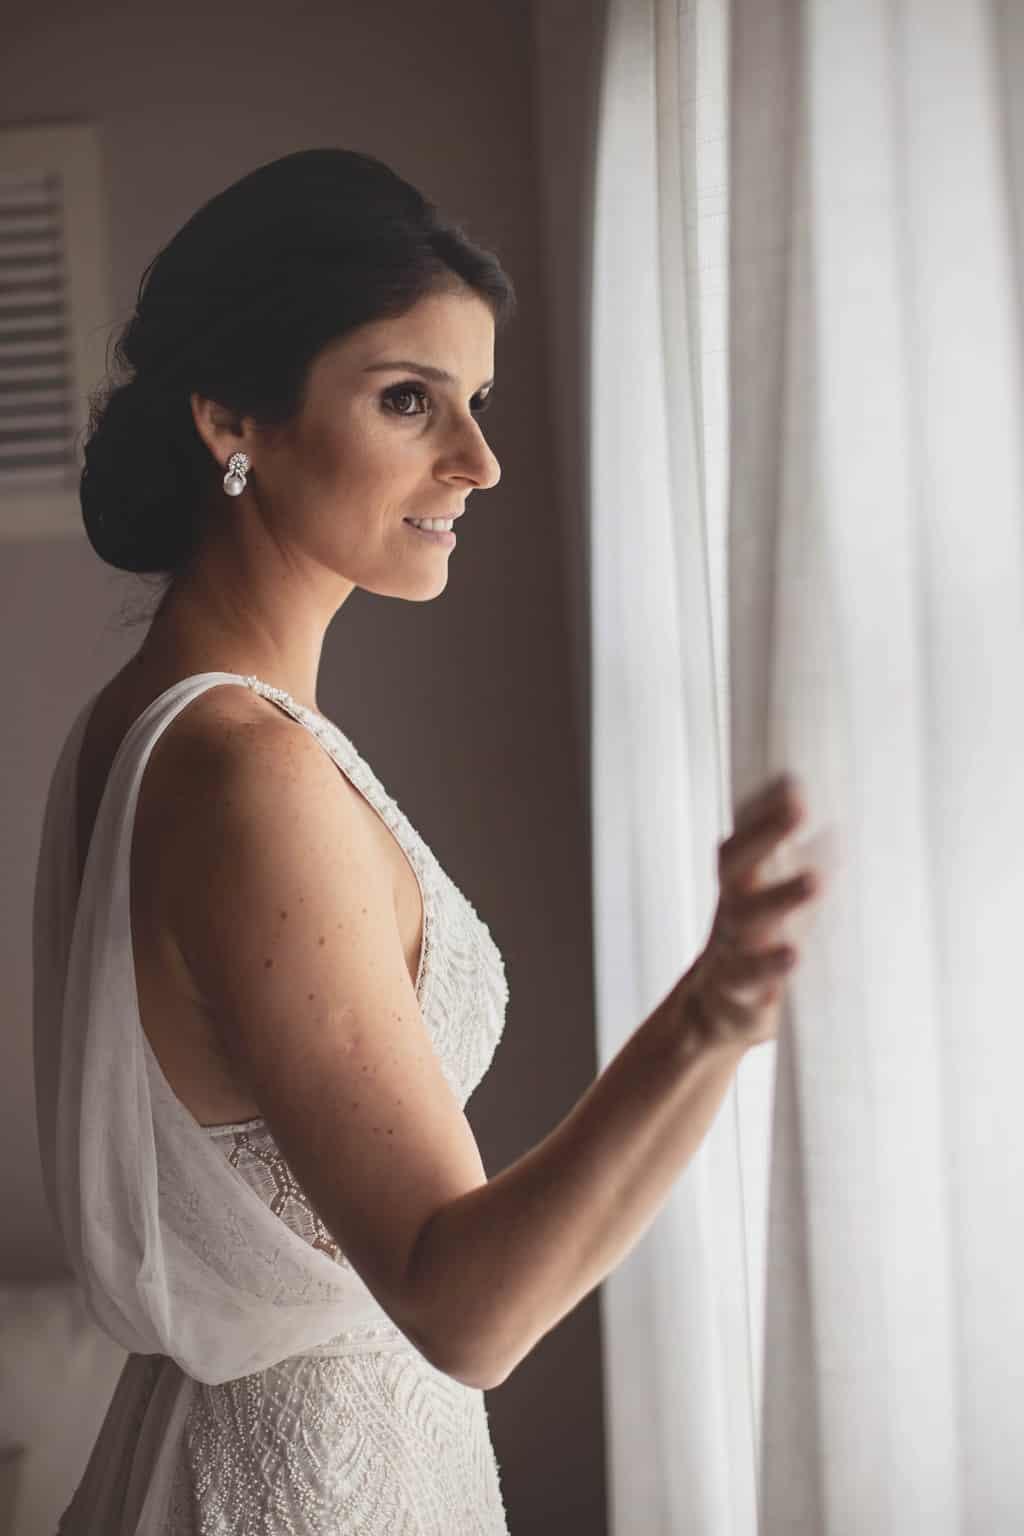 casamento-Ana-Cecilia-e-Leonardo-casamento-na-serra-graviola-filmes-graviolafilmes-laura-camapnella-de-siervi-lauracampanella-studio-laura-camapnella14